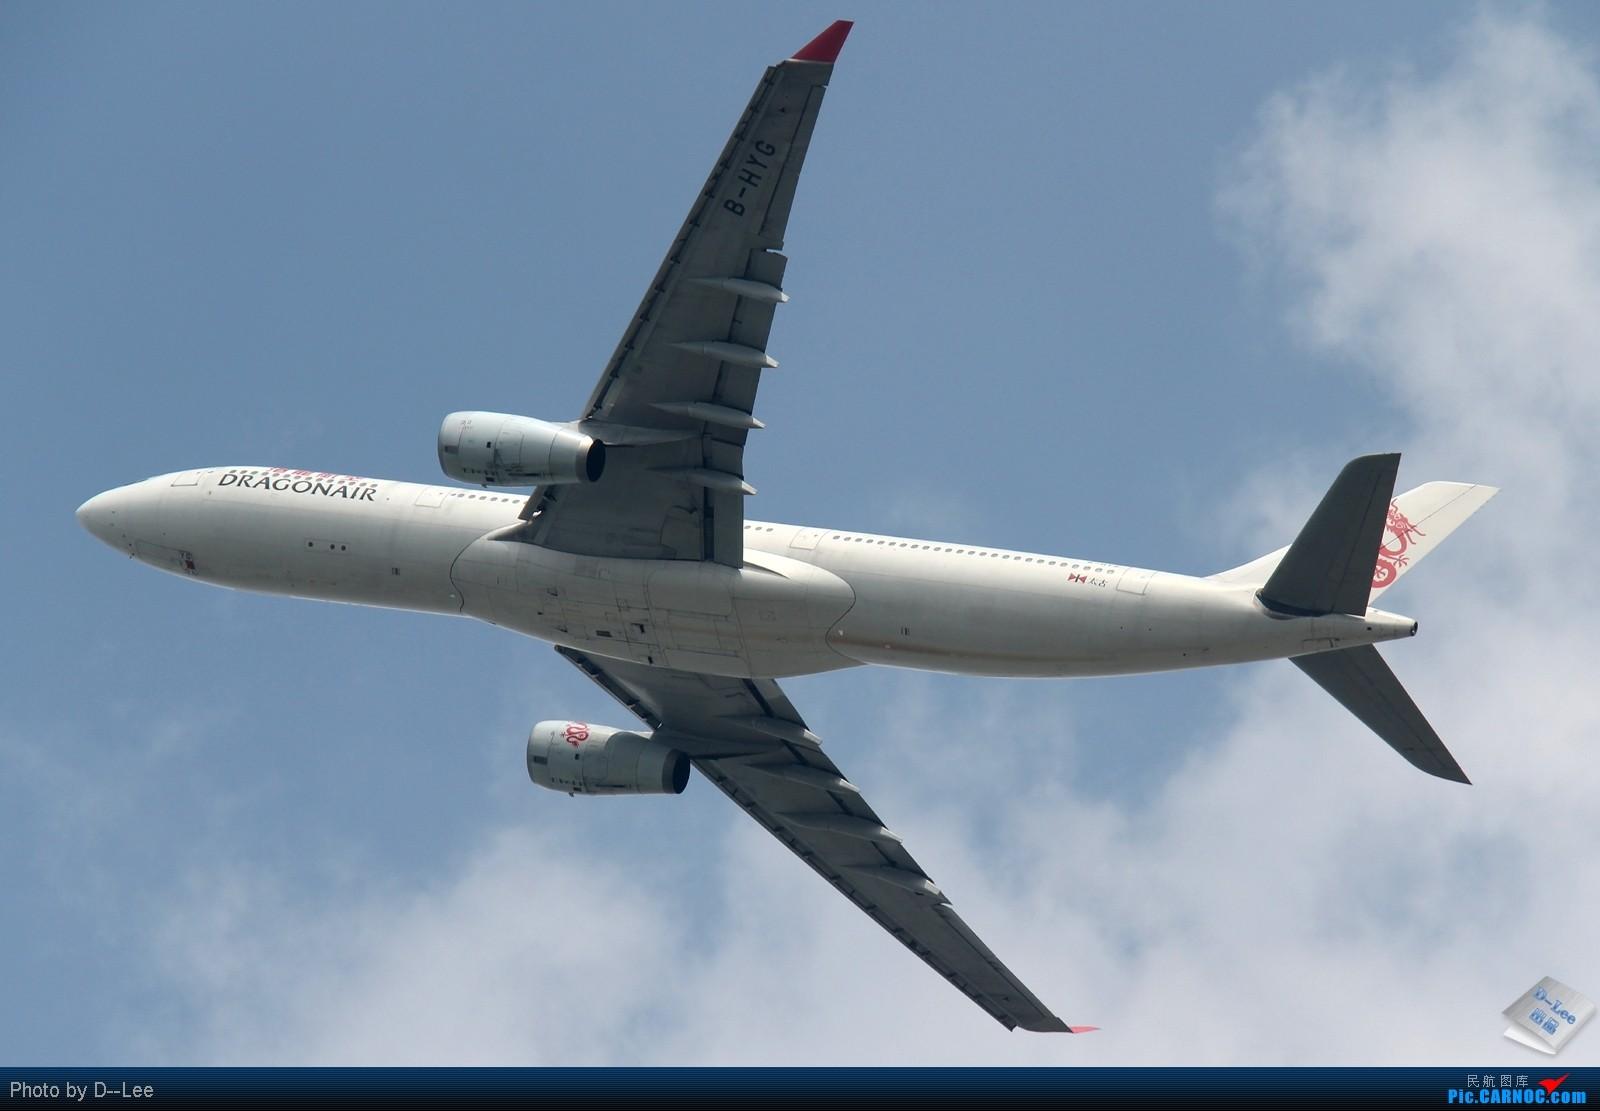 Re:[原创]【广州,你好】-南航SKY TEAM332,港龙333,泰航大星星333外加拍少见少东航AB6全程1600大图放送 AIRBUS A330-300 B-HYG 中国广州白云机场